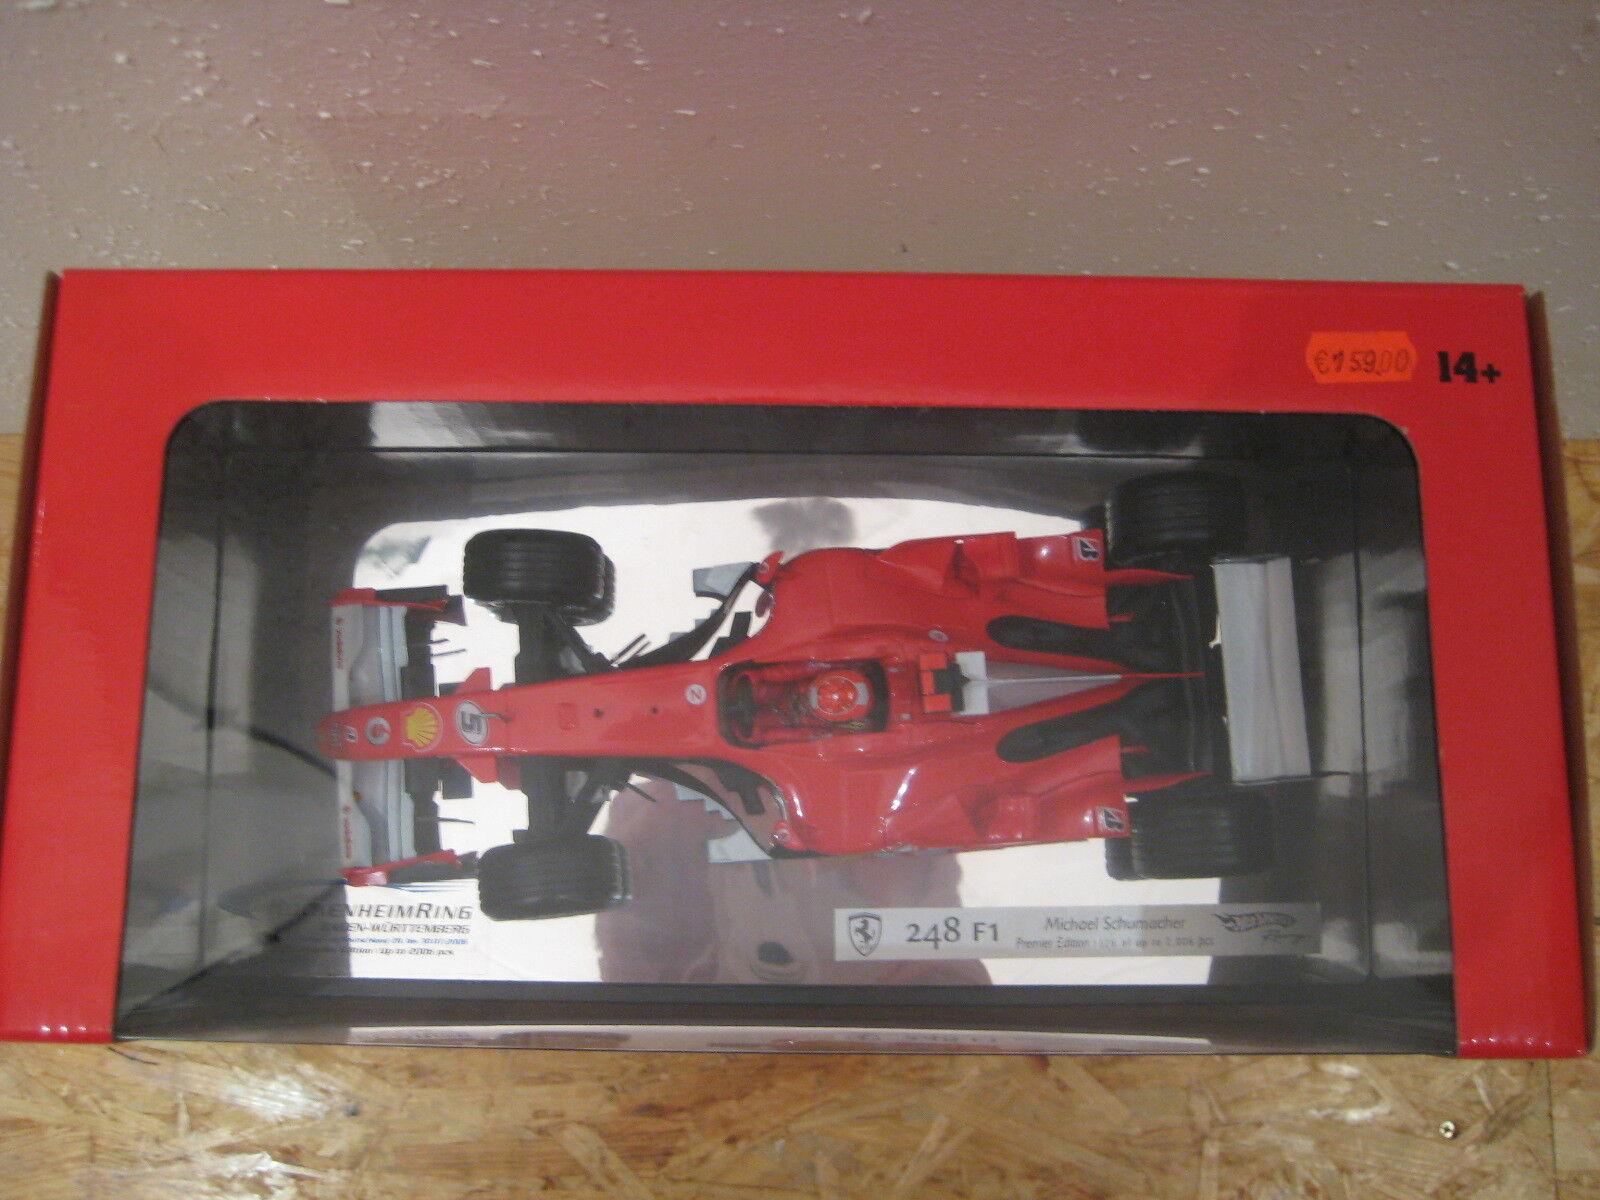 2006 RARO M. Schumacher Ferrari 248 f1 Premier Edition Evian GP Formula 1